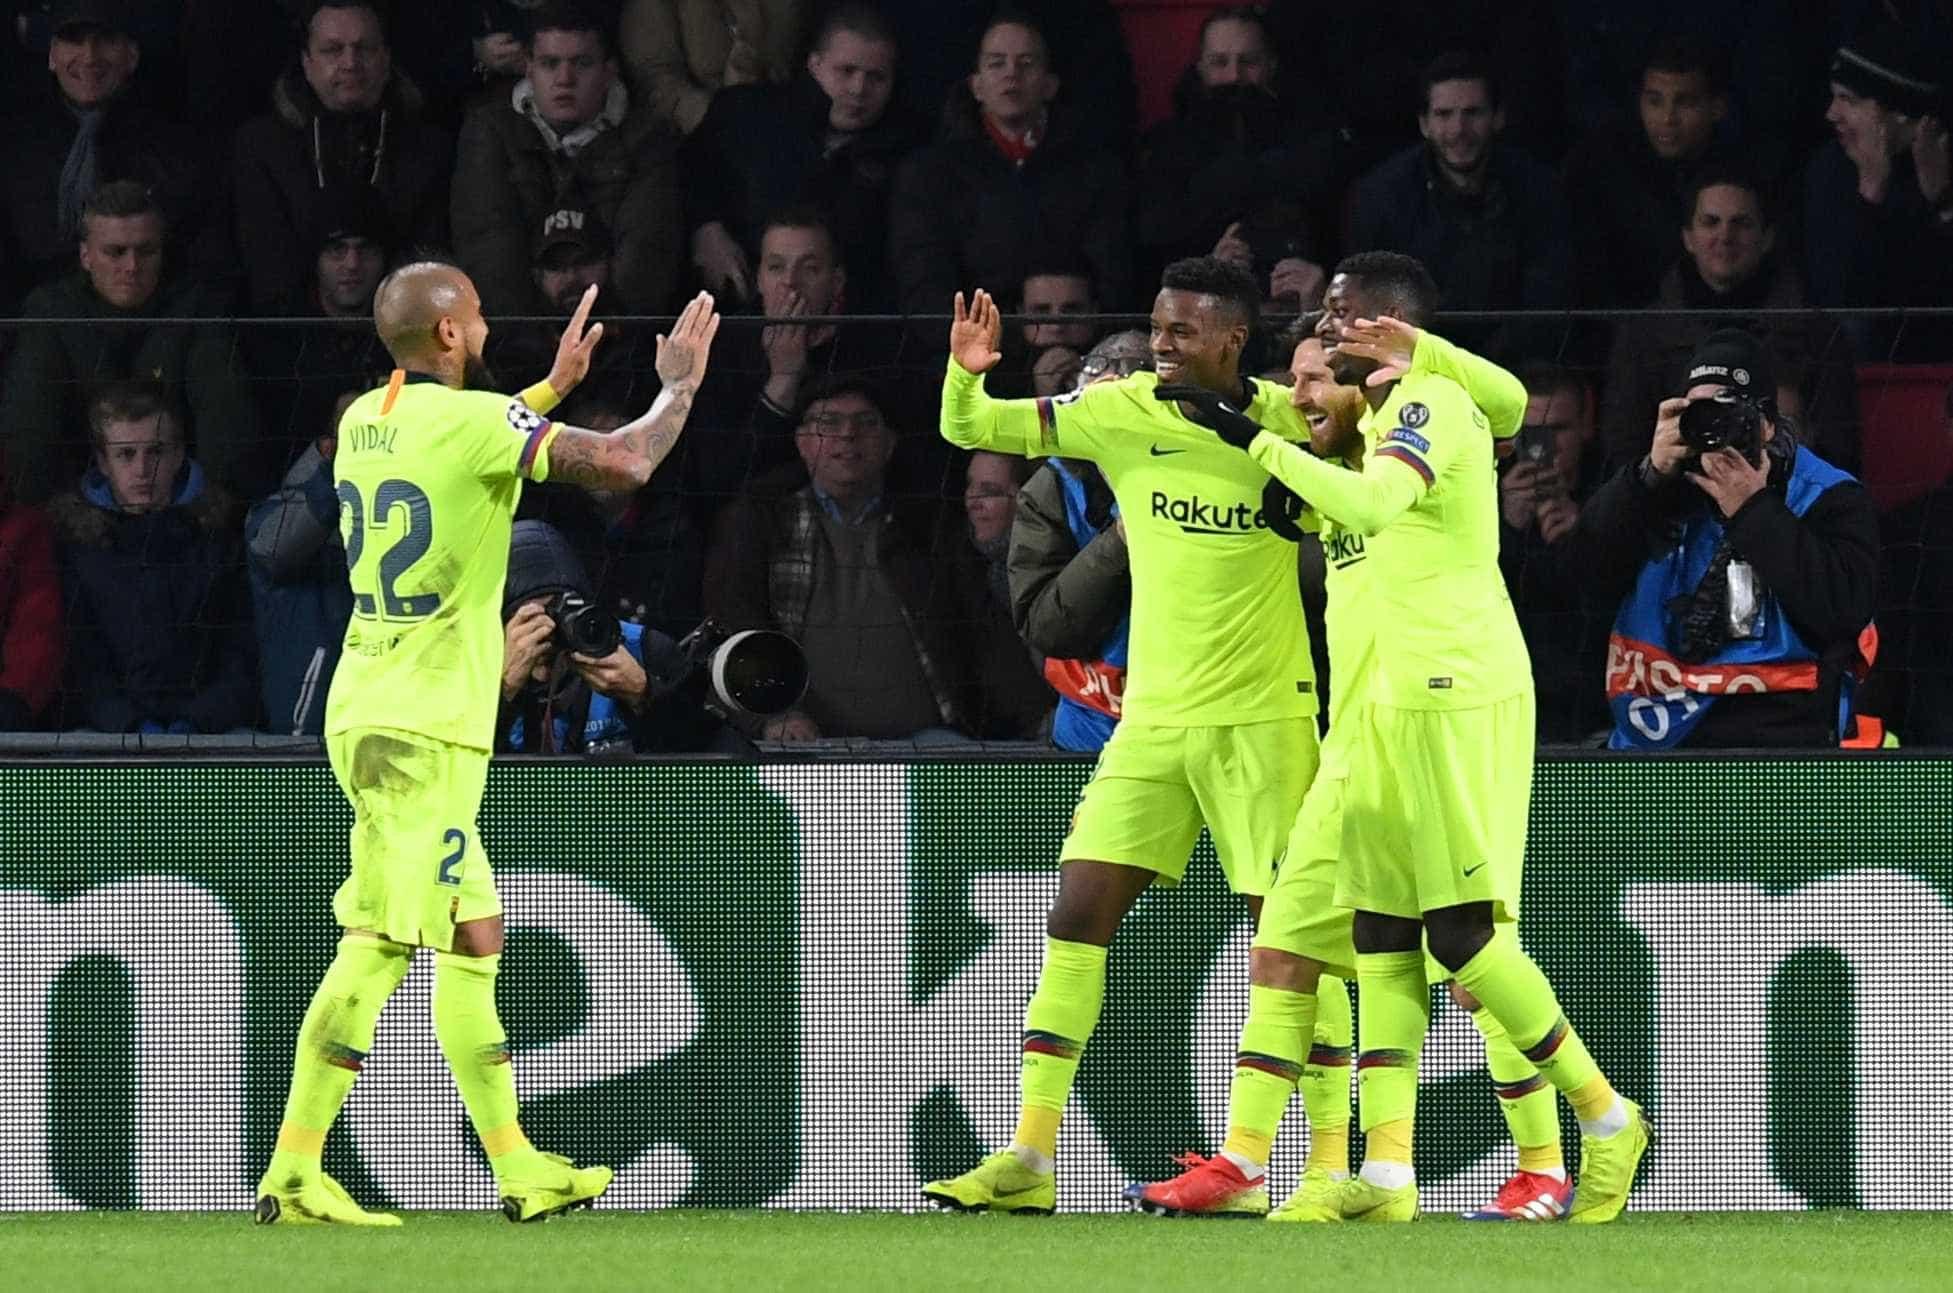 Com gol de Messi, Barça supera PSV e avança; Tottenham bate a Inter